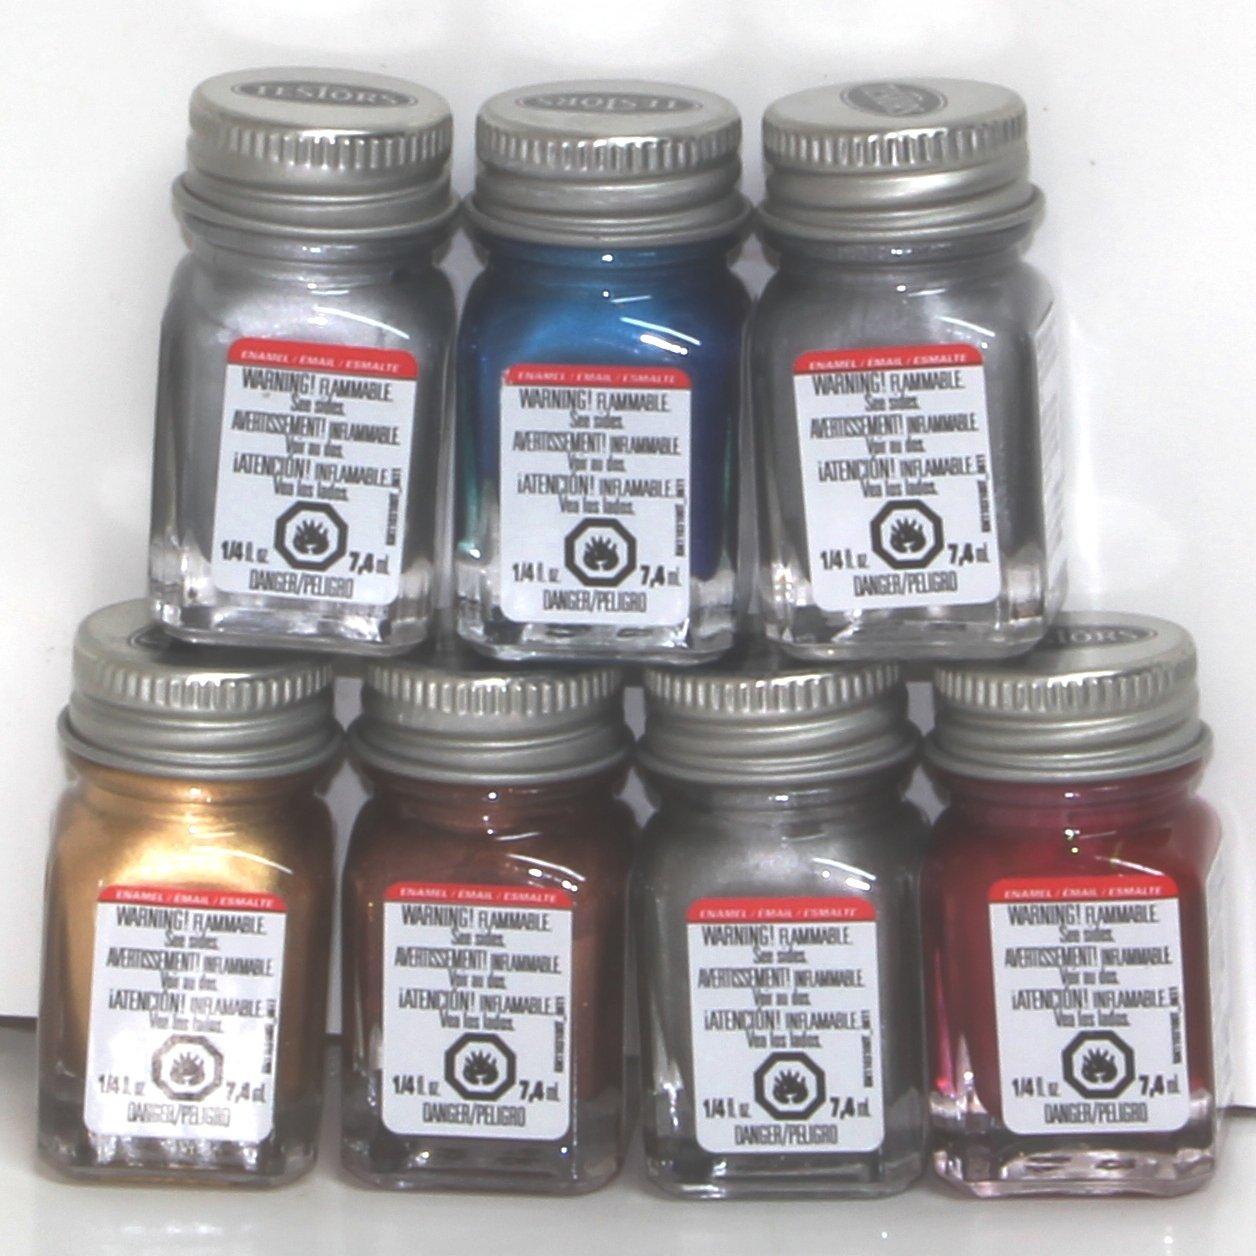 Amazon Testors Enamel Paints 7 Metallic Color Set 1 14 Oz